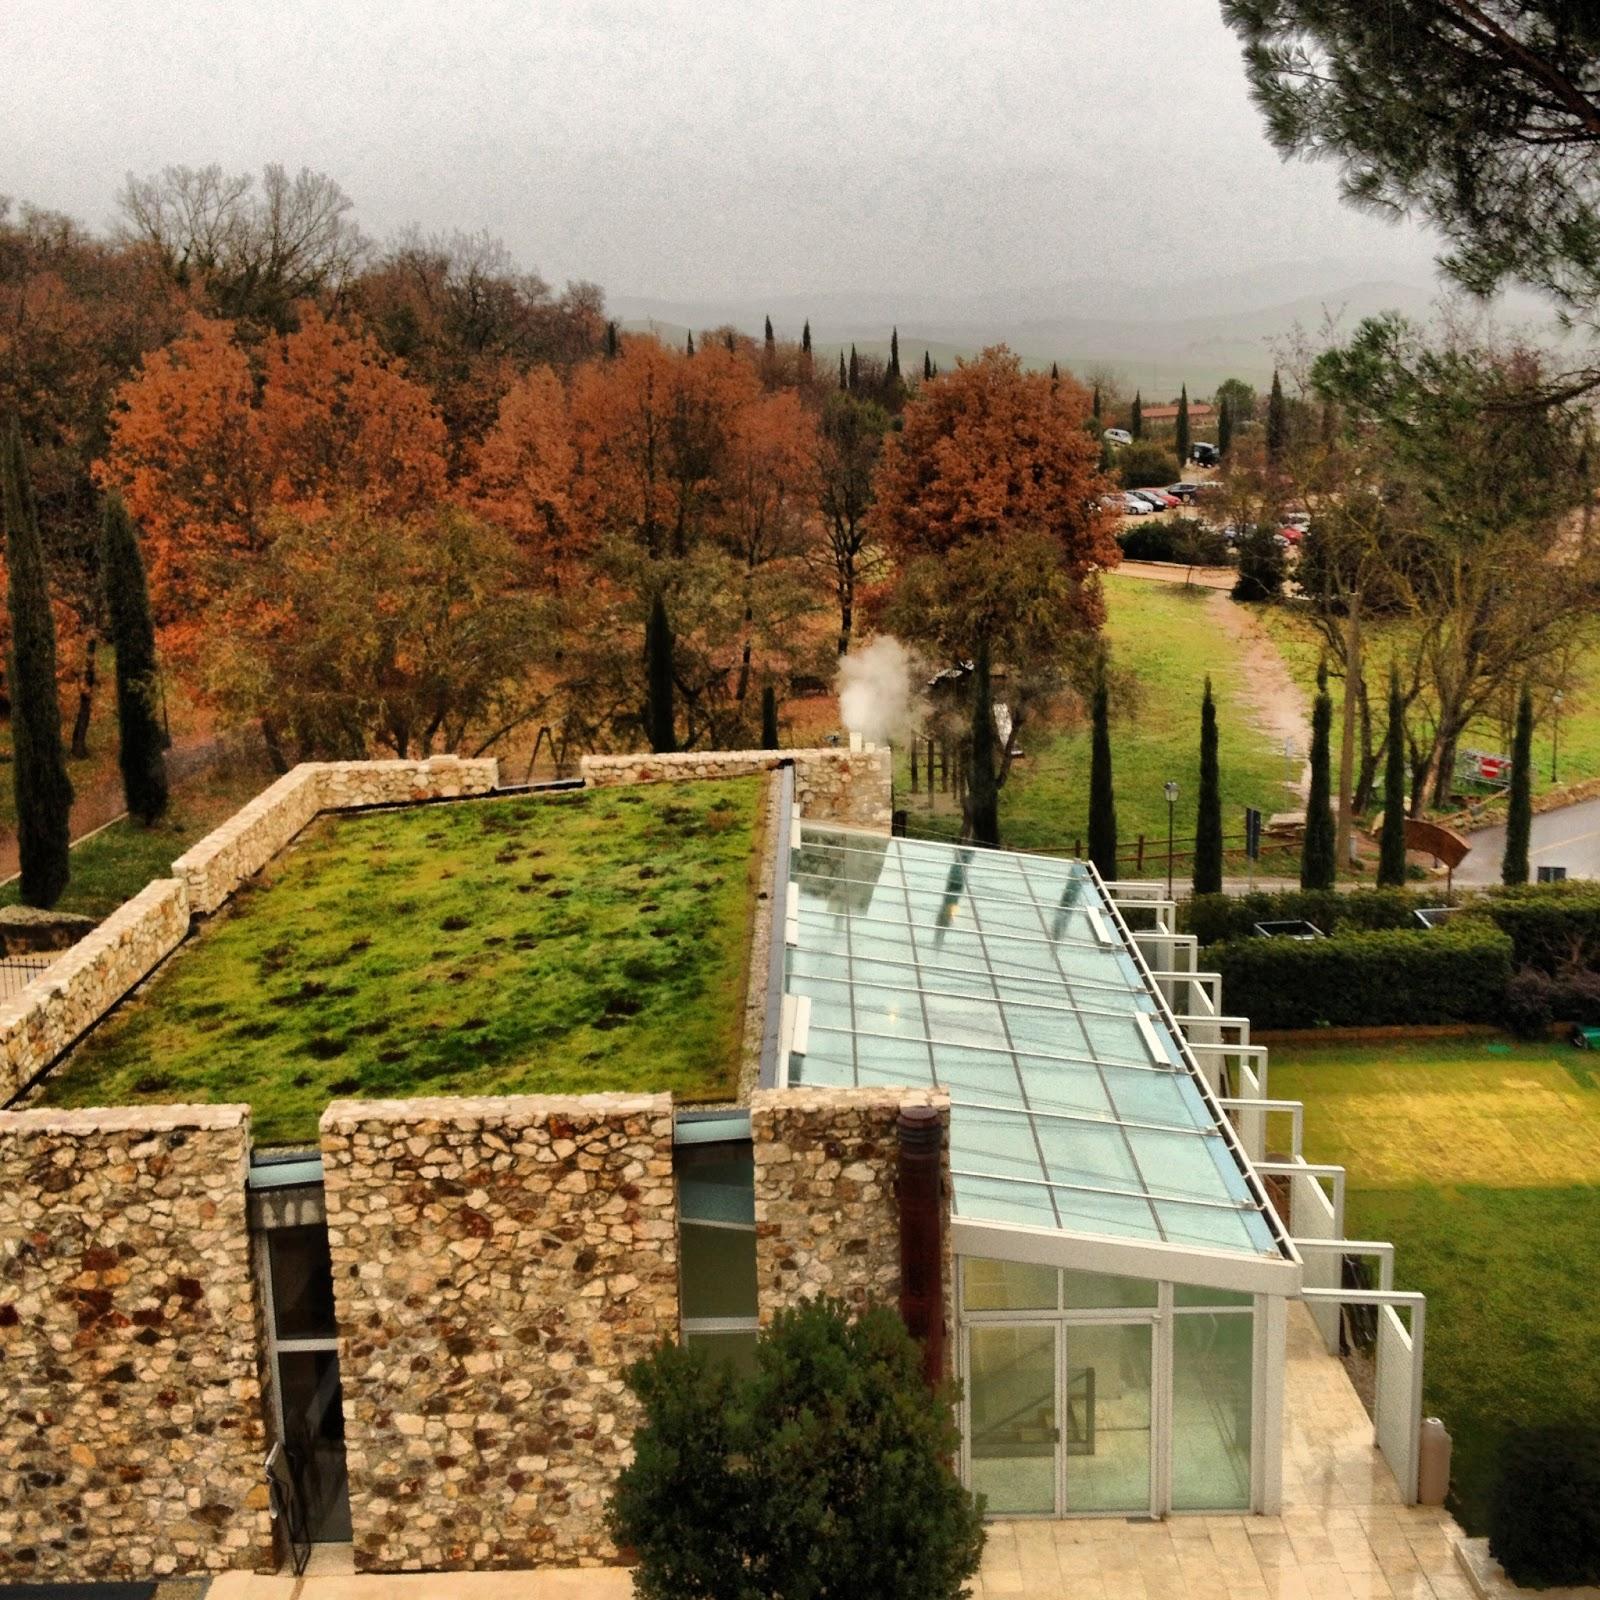 Bagno vignoni thermal baths in tuscany - Albergo le terme bagno vignoni ...